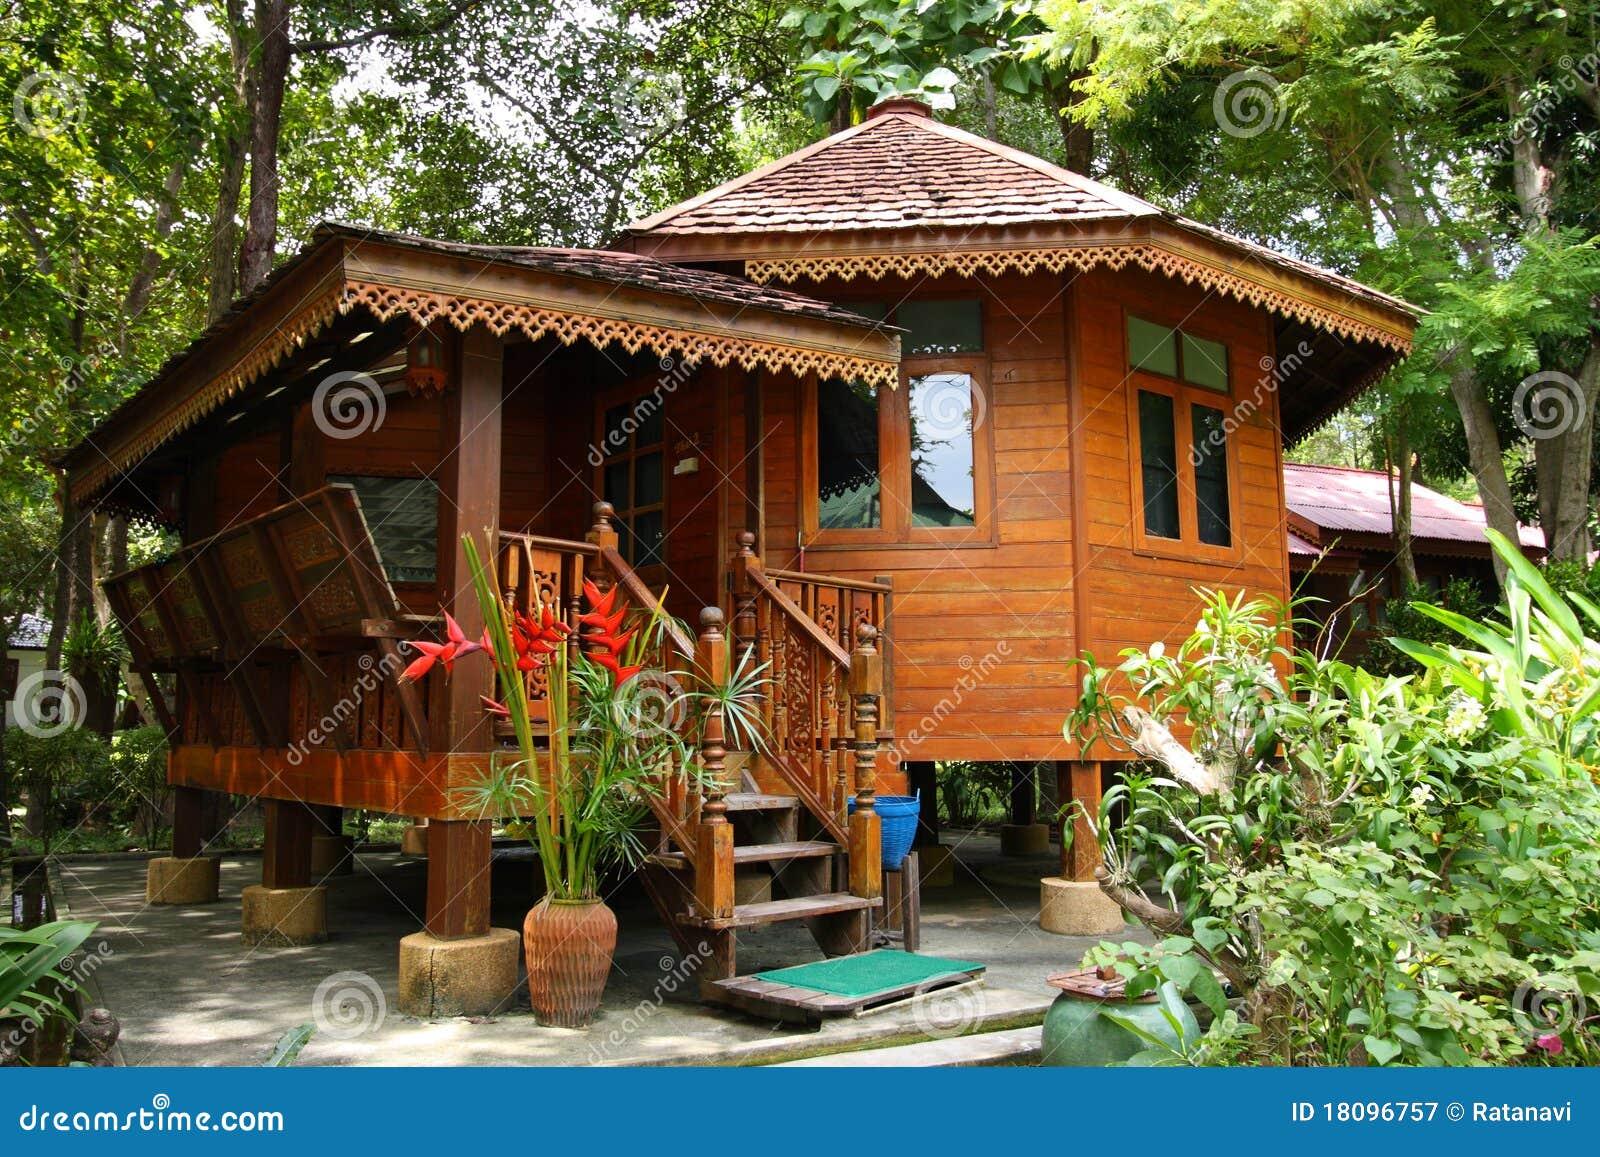 Casa oriental do estilo fotografia de stock royalty free - Estilo de casas ...